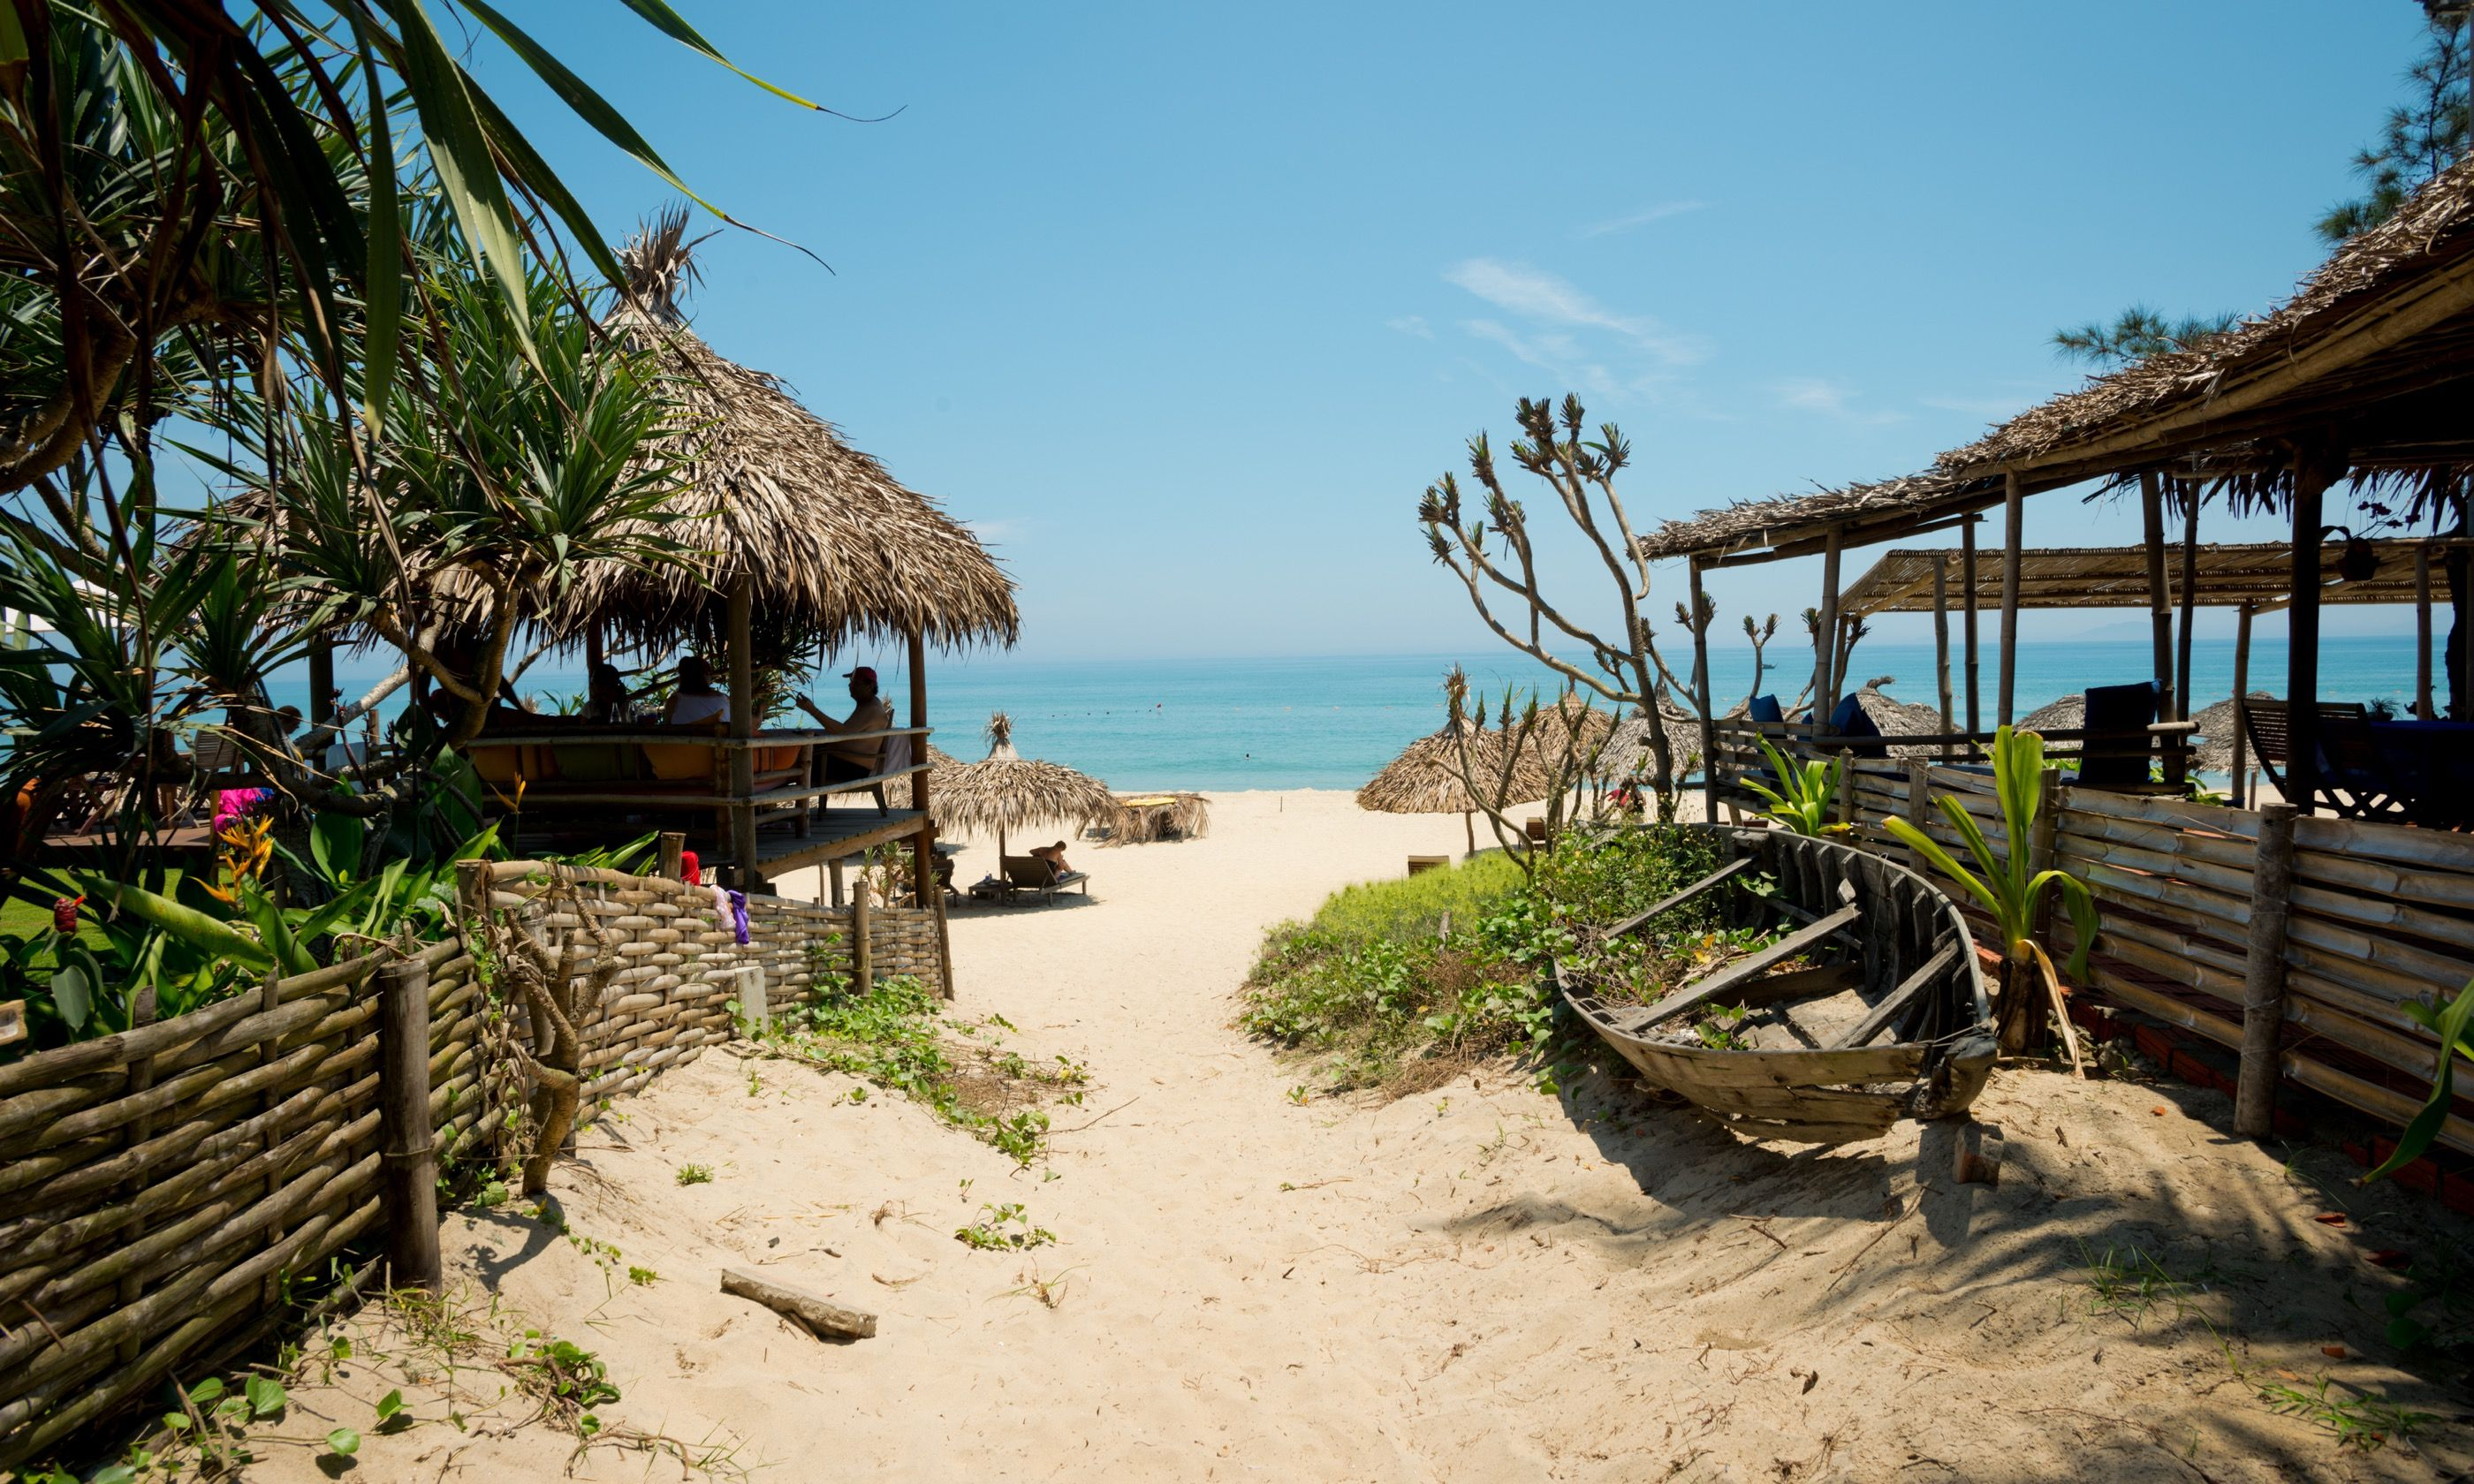 Ang Bang beach near Hoi An (Dreamstime)